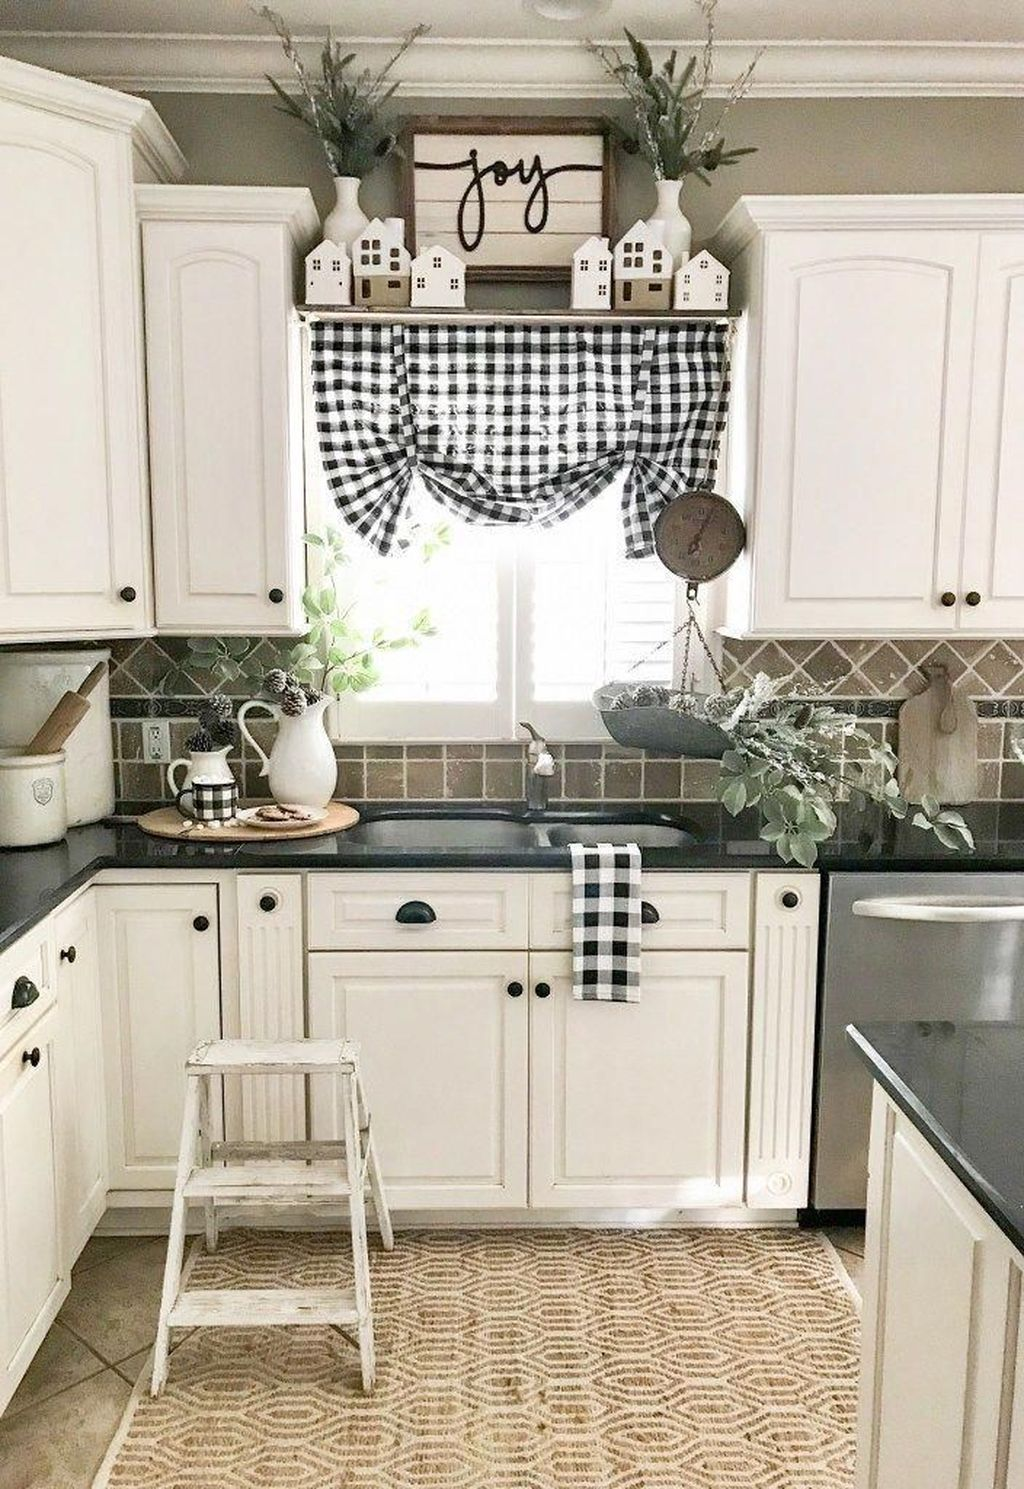 36 Inspiring Country Kitchen Decor Ideas You Should Copy Hmdcrtn